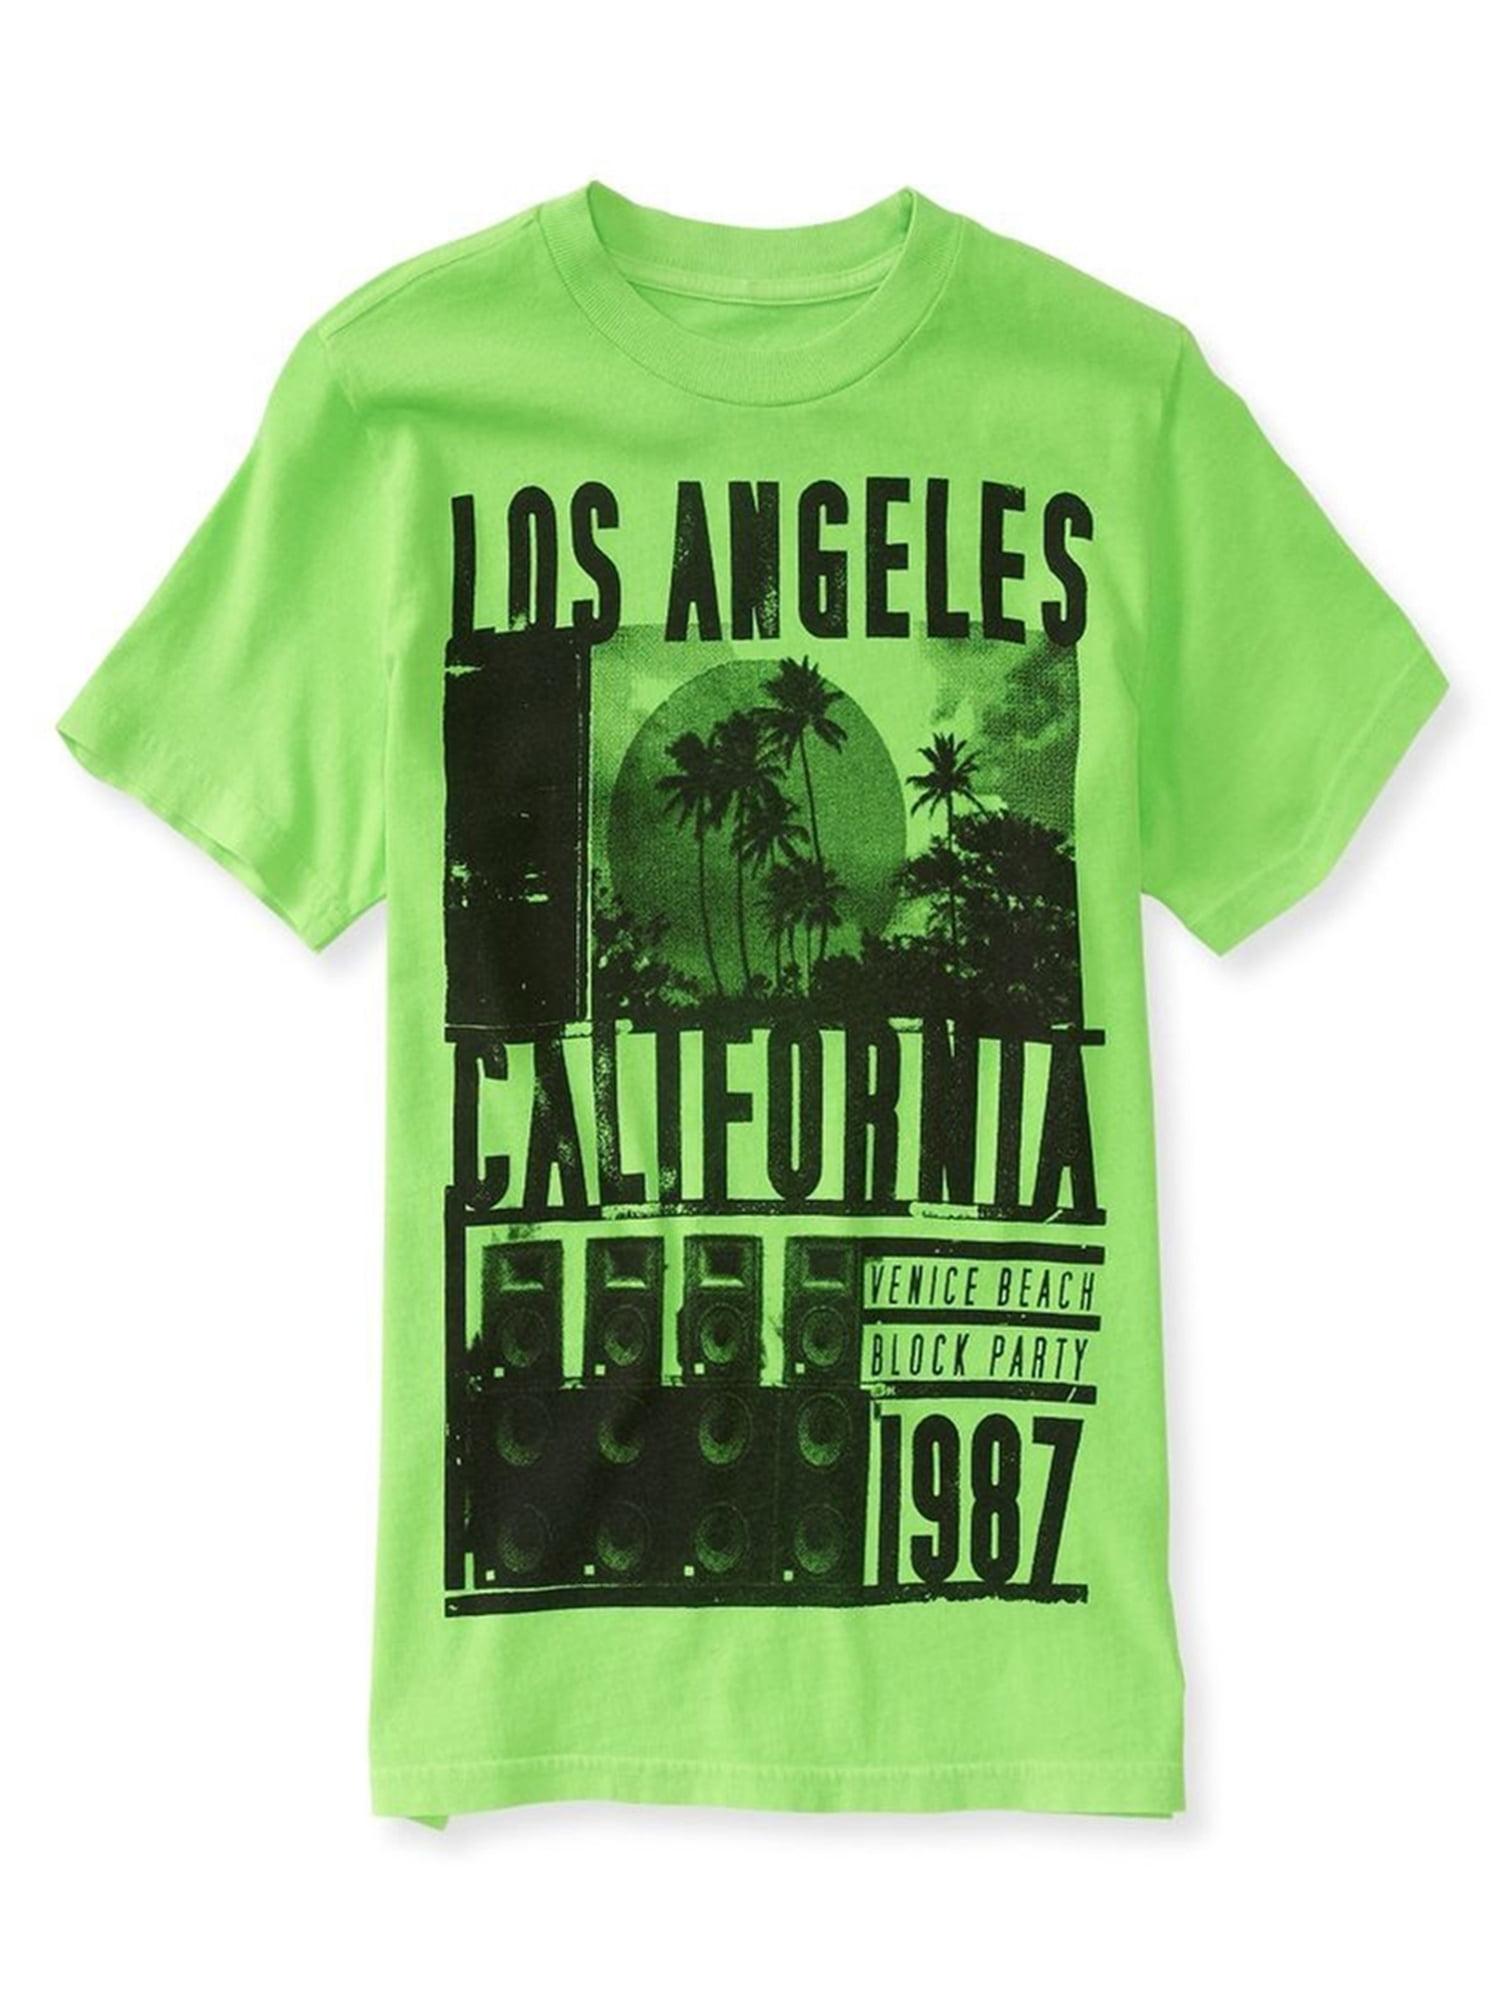 Aeropostale Boys Los Angeles Graphic T-Shirt 366 4 - Little Kids (4-7)